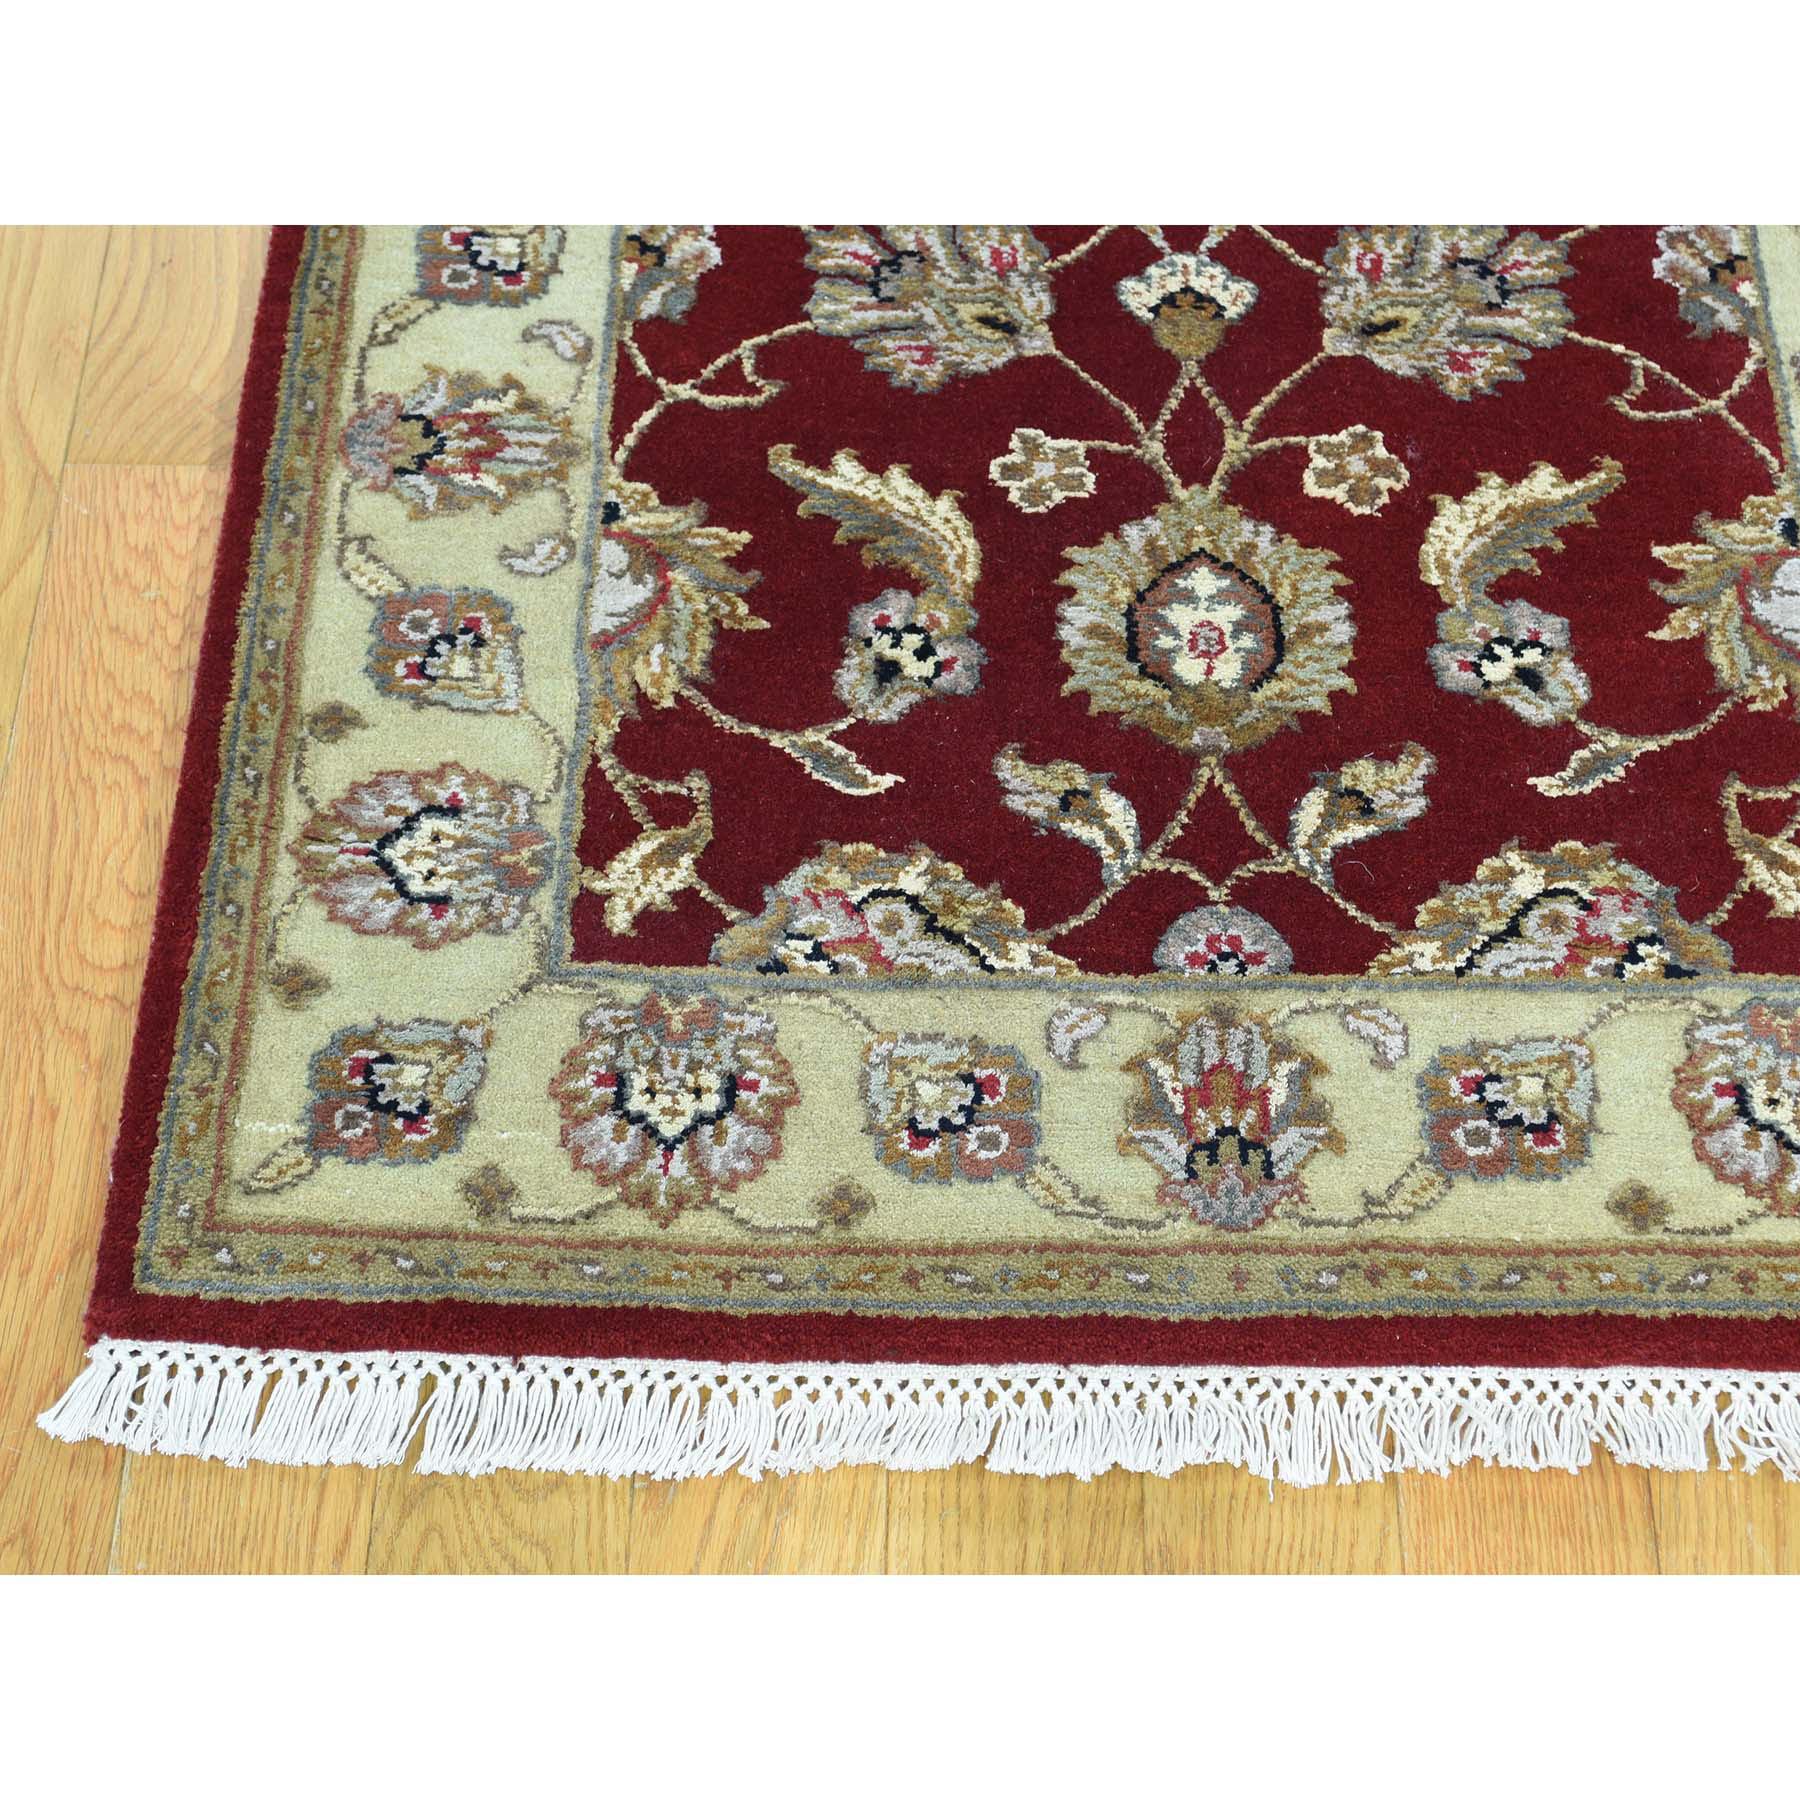 2-6 x14-10  Half Wool And Half Silk Red Rajasthan XL Runner Handmade Rug